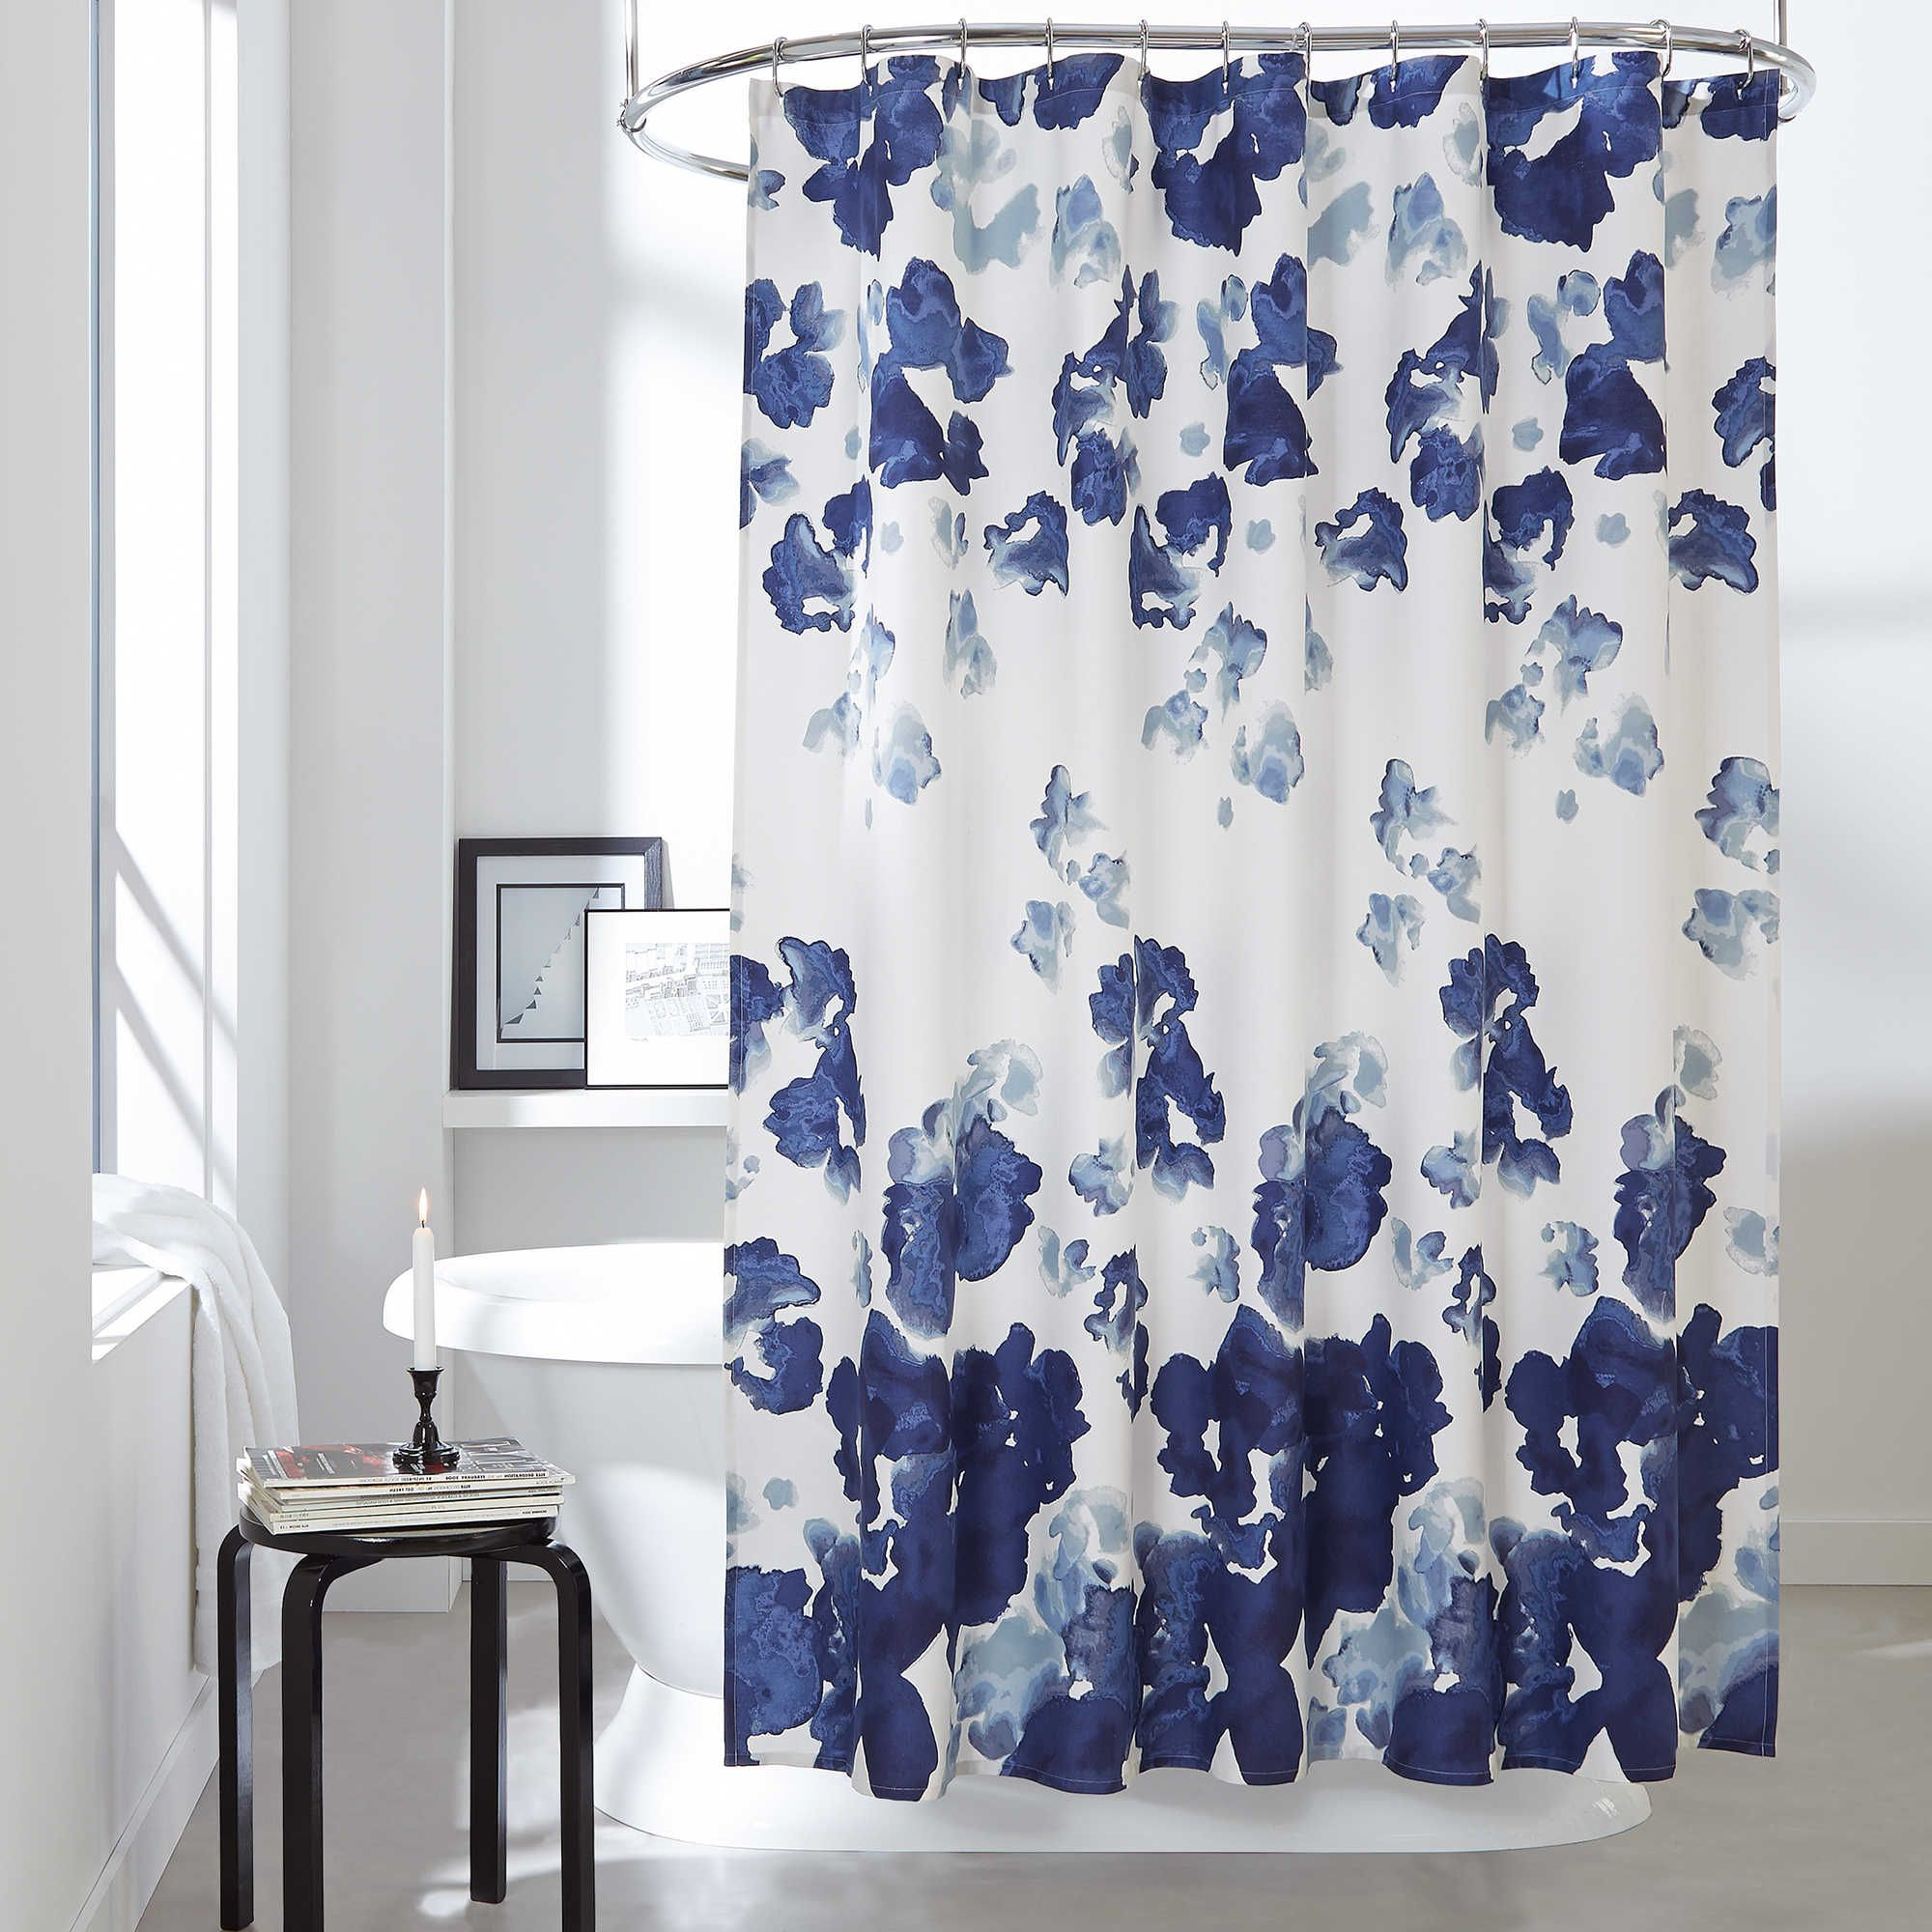 Dkny Park Slope Cotton Shower Curtain Cotton Shower Curtain